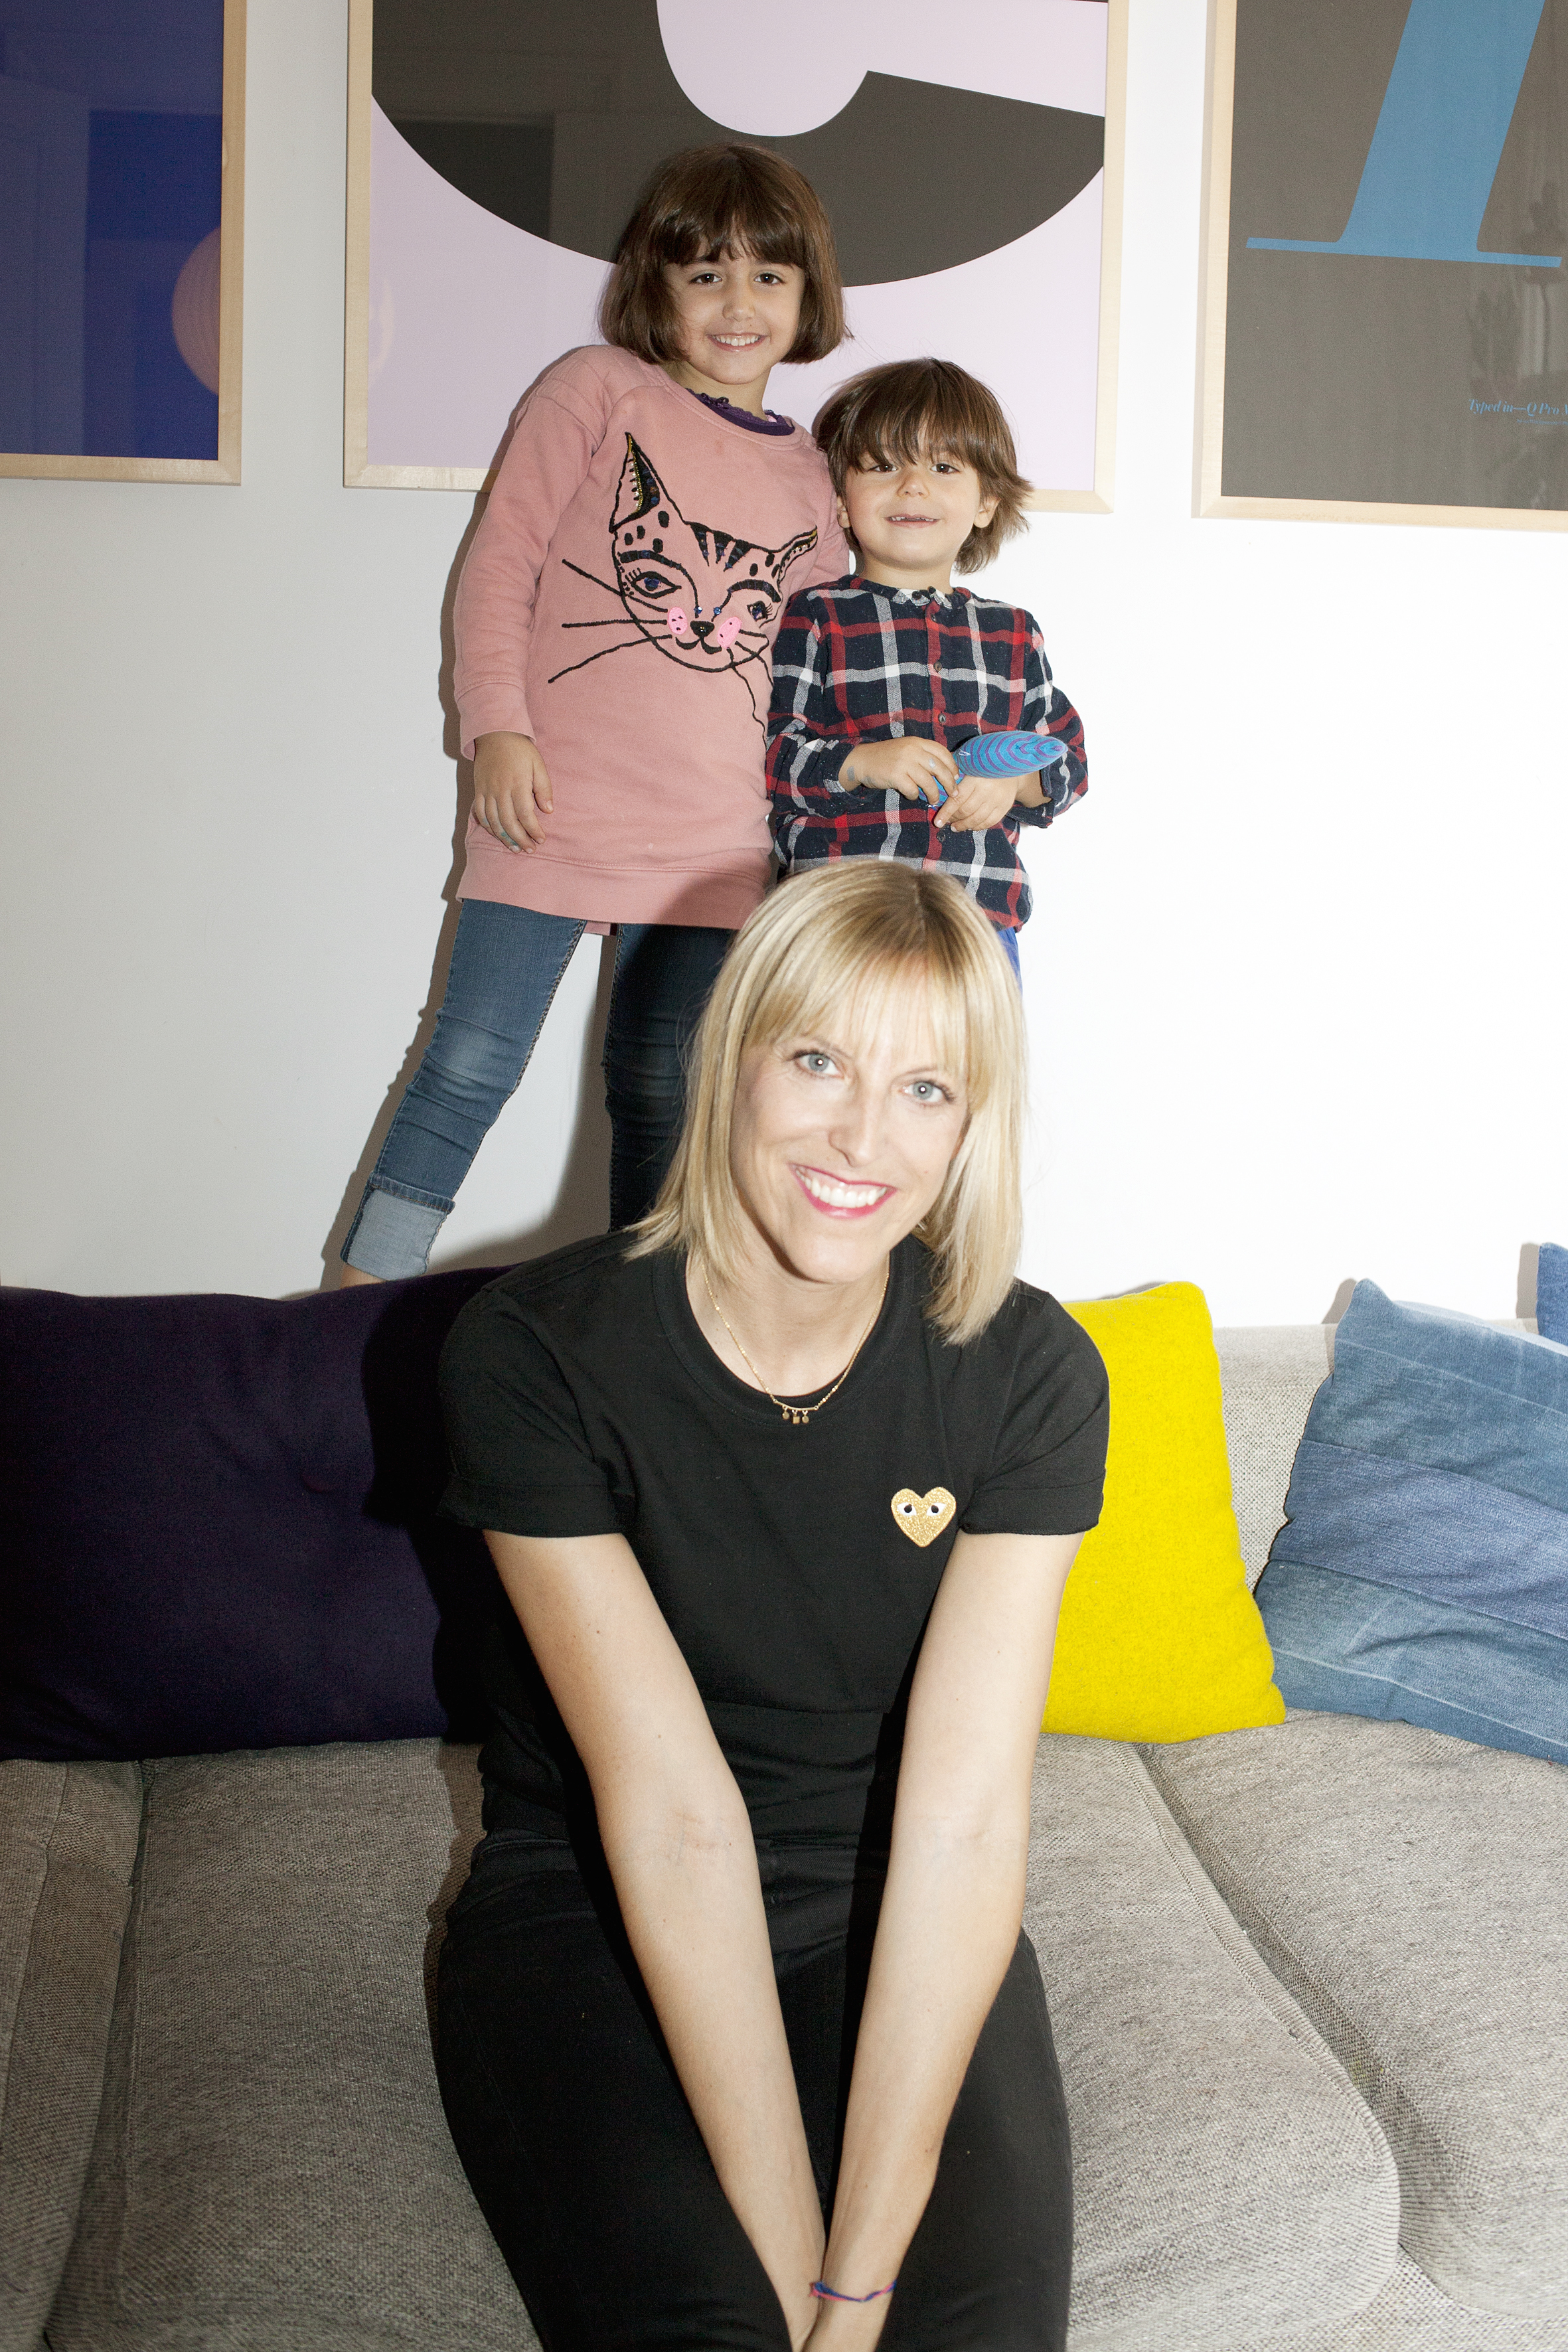 JuliaWinkels&Kids_FranziskaTaffelt_Col008 Kopie